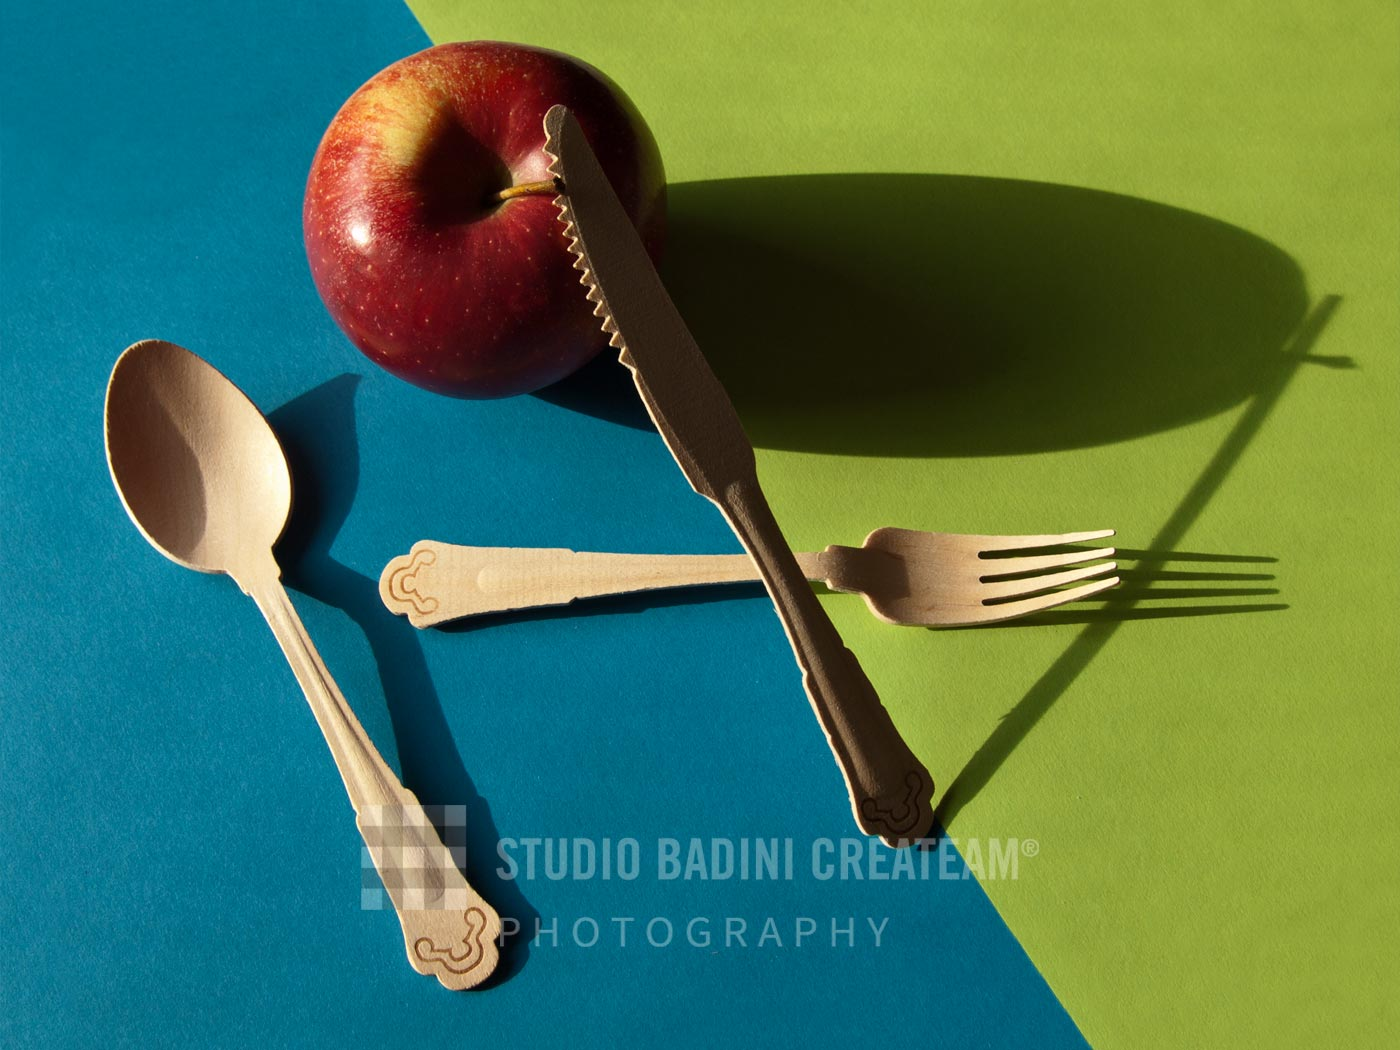 Badini Creative Studio - fotografia - seletti - tablee